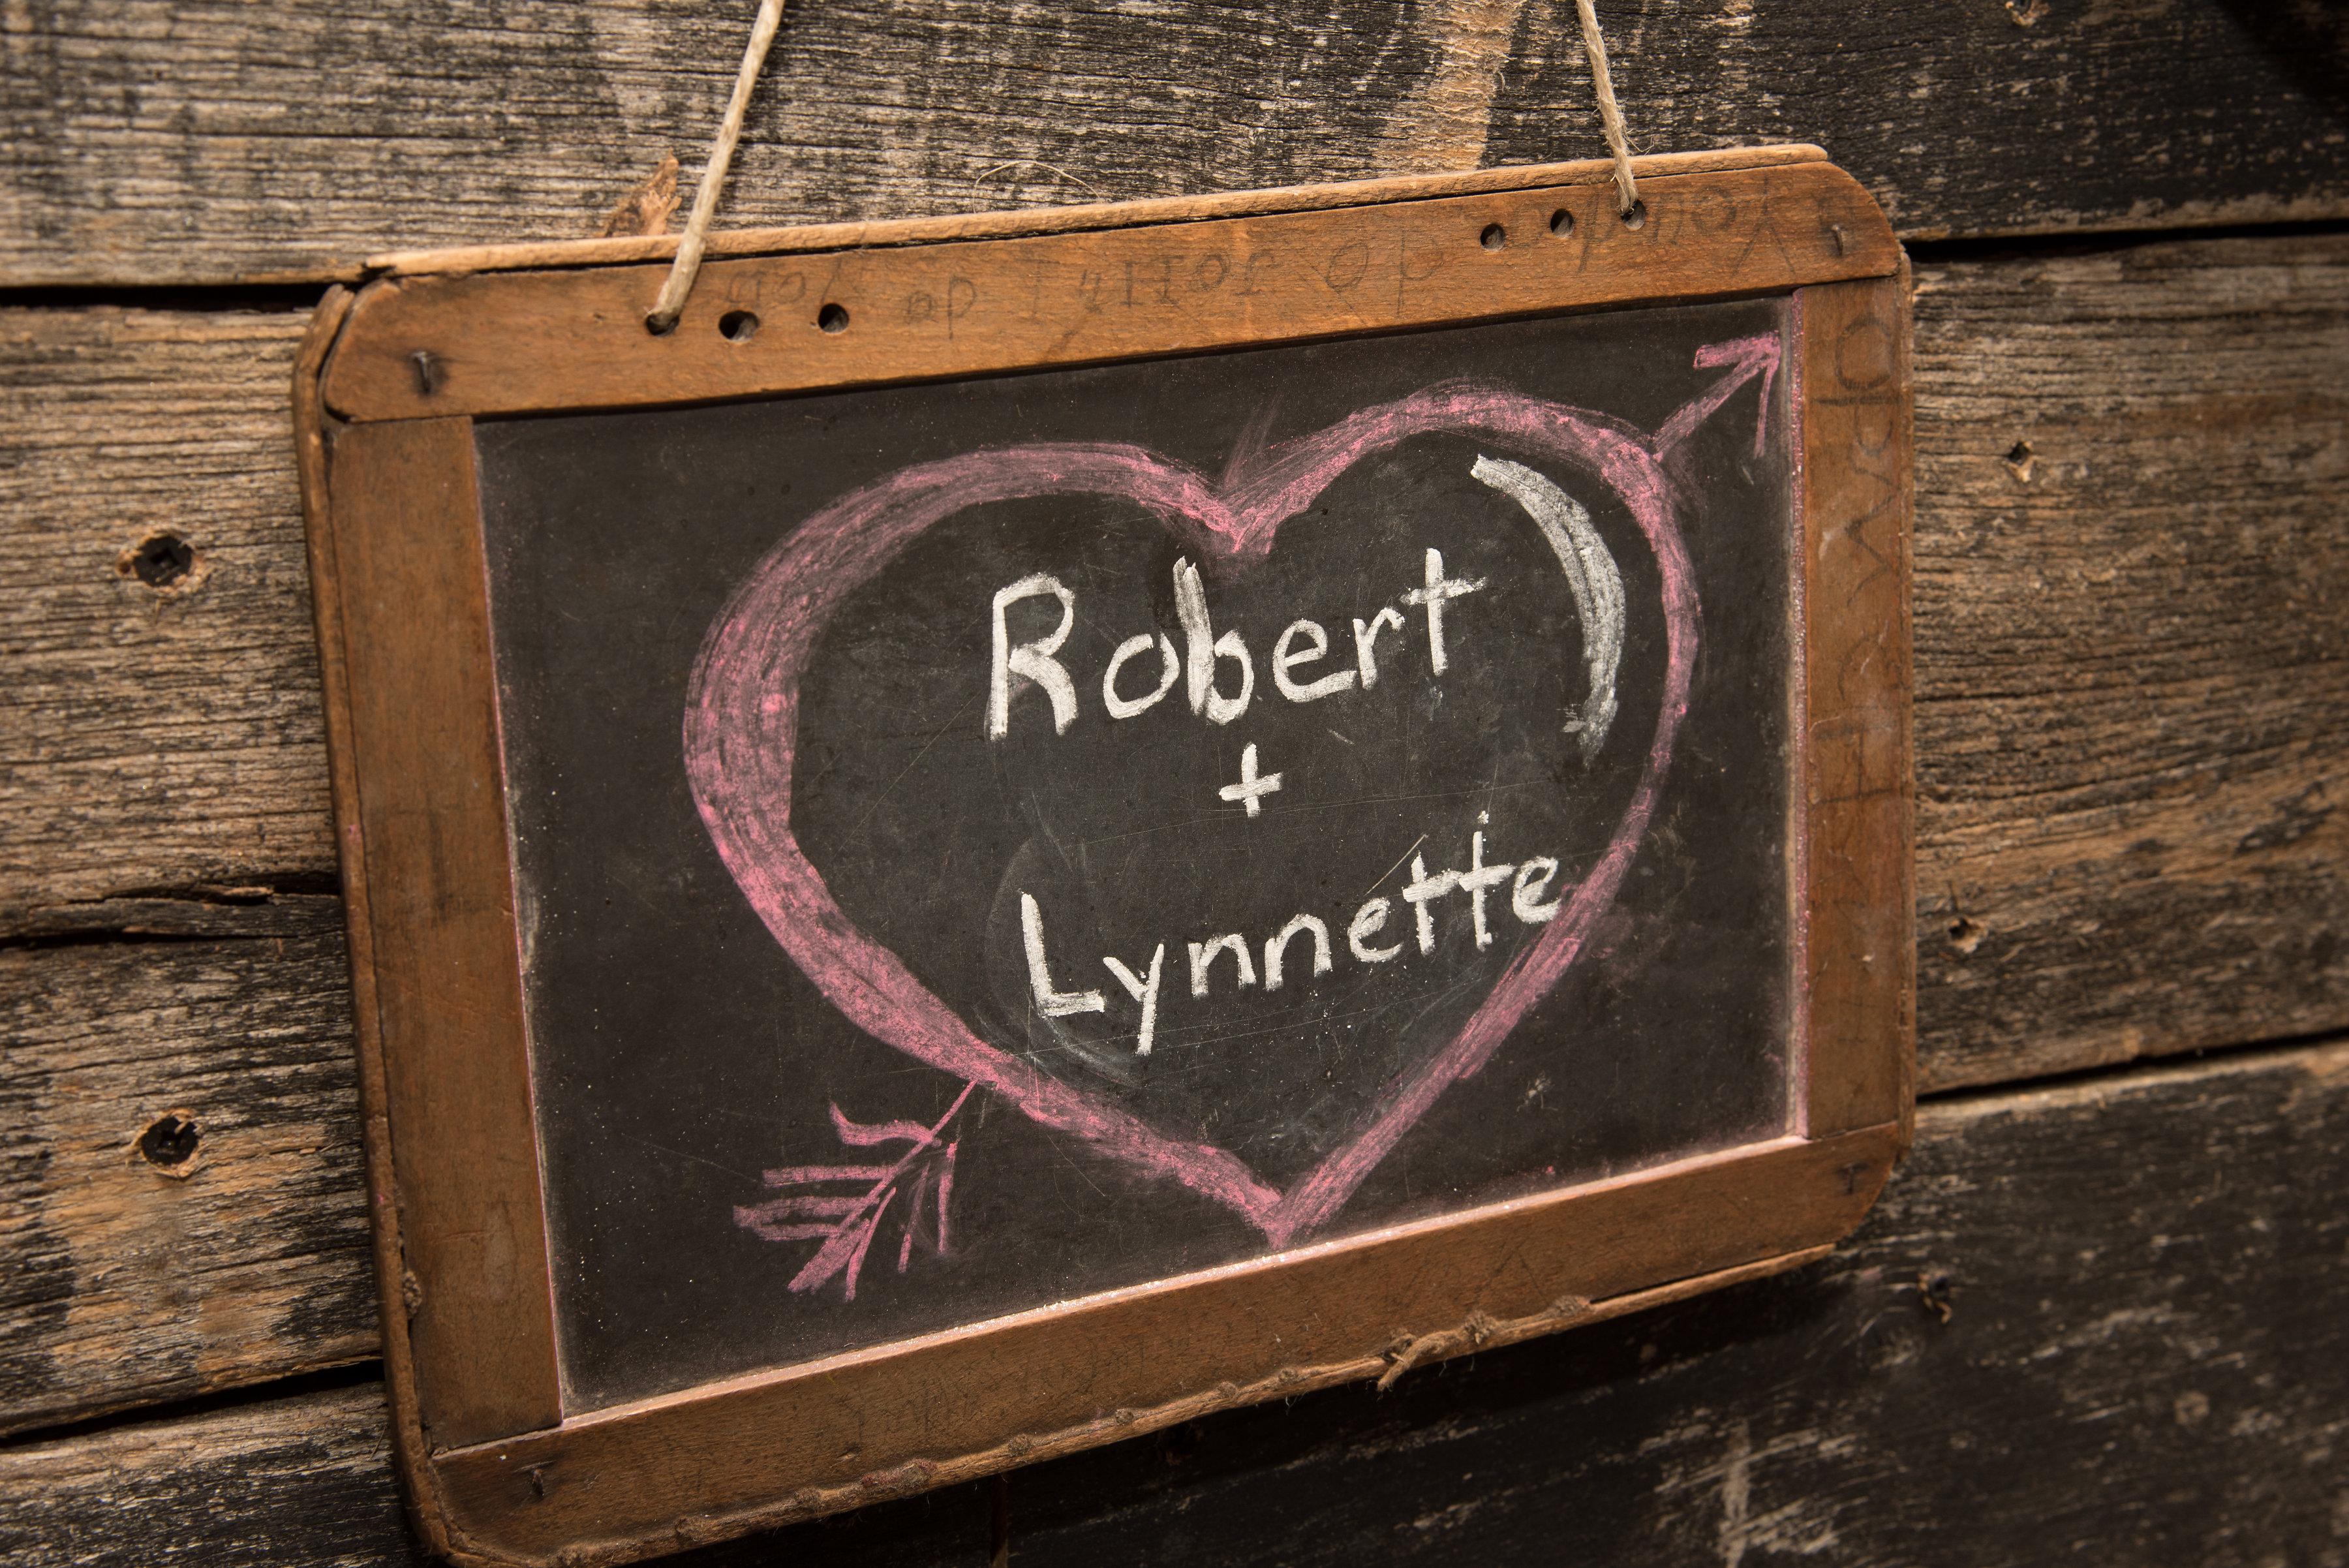 Robert and Lynette